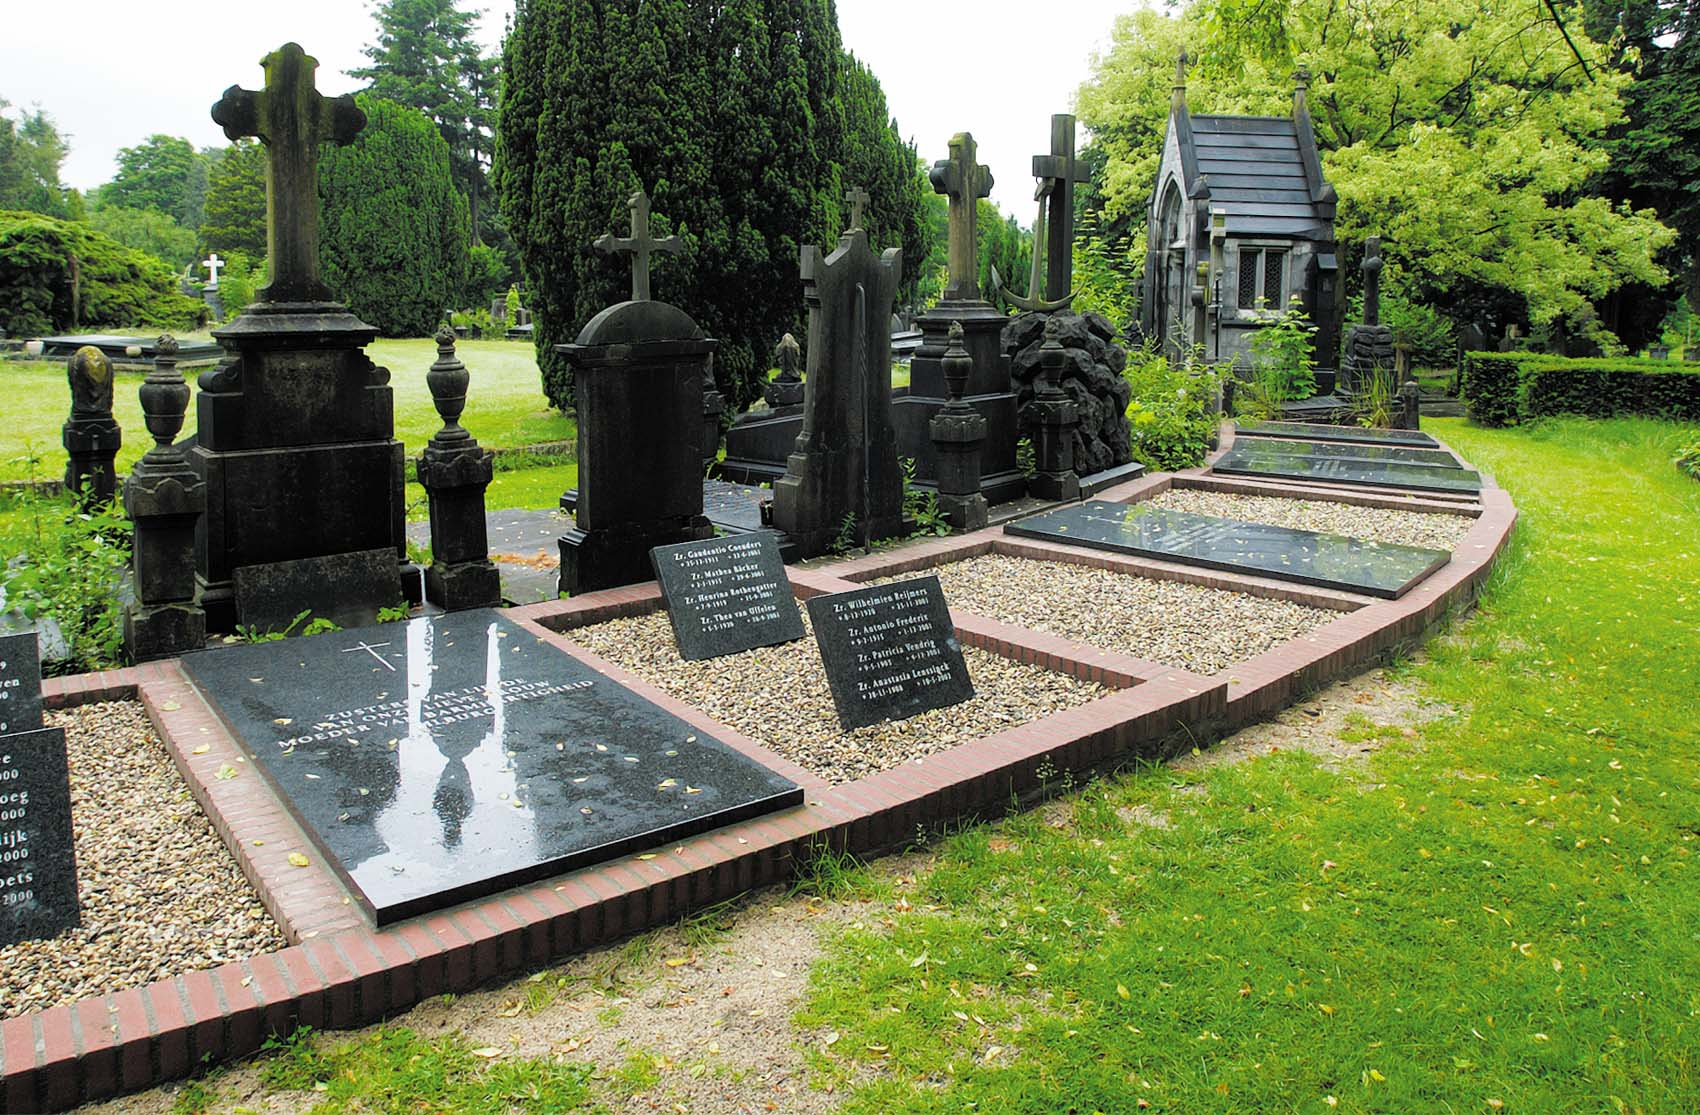 Moscowa Cemetery & Crematorium (Arnhem, Netherlands)